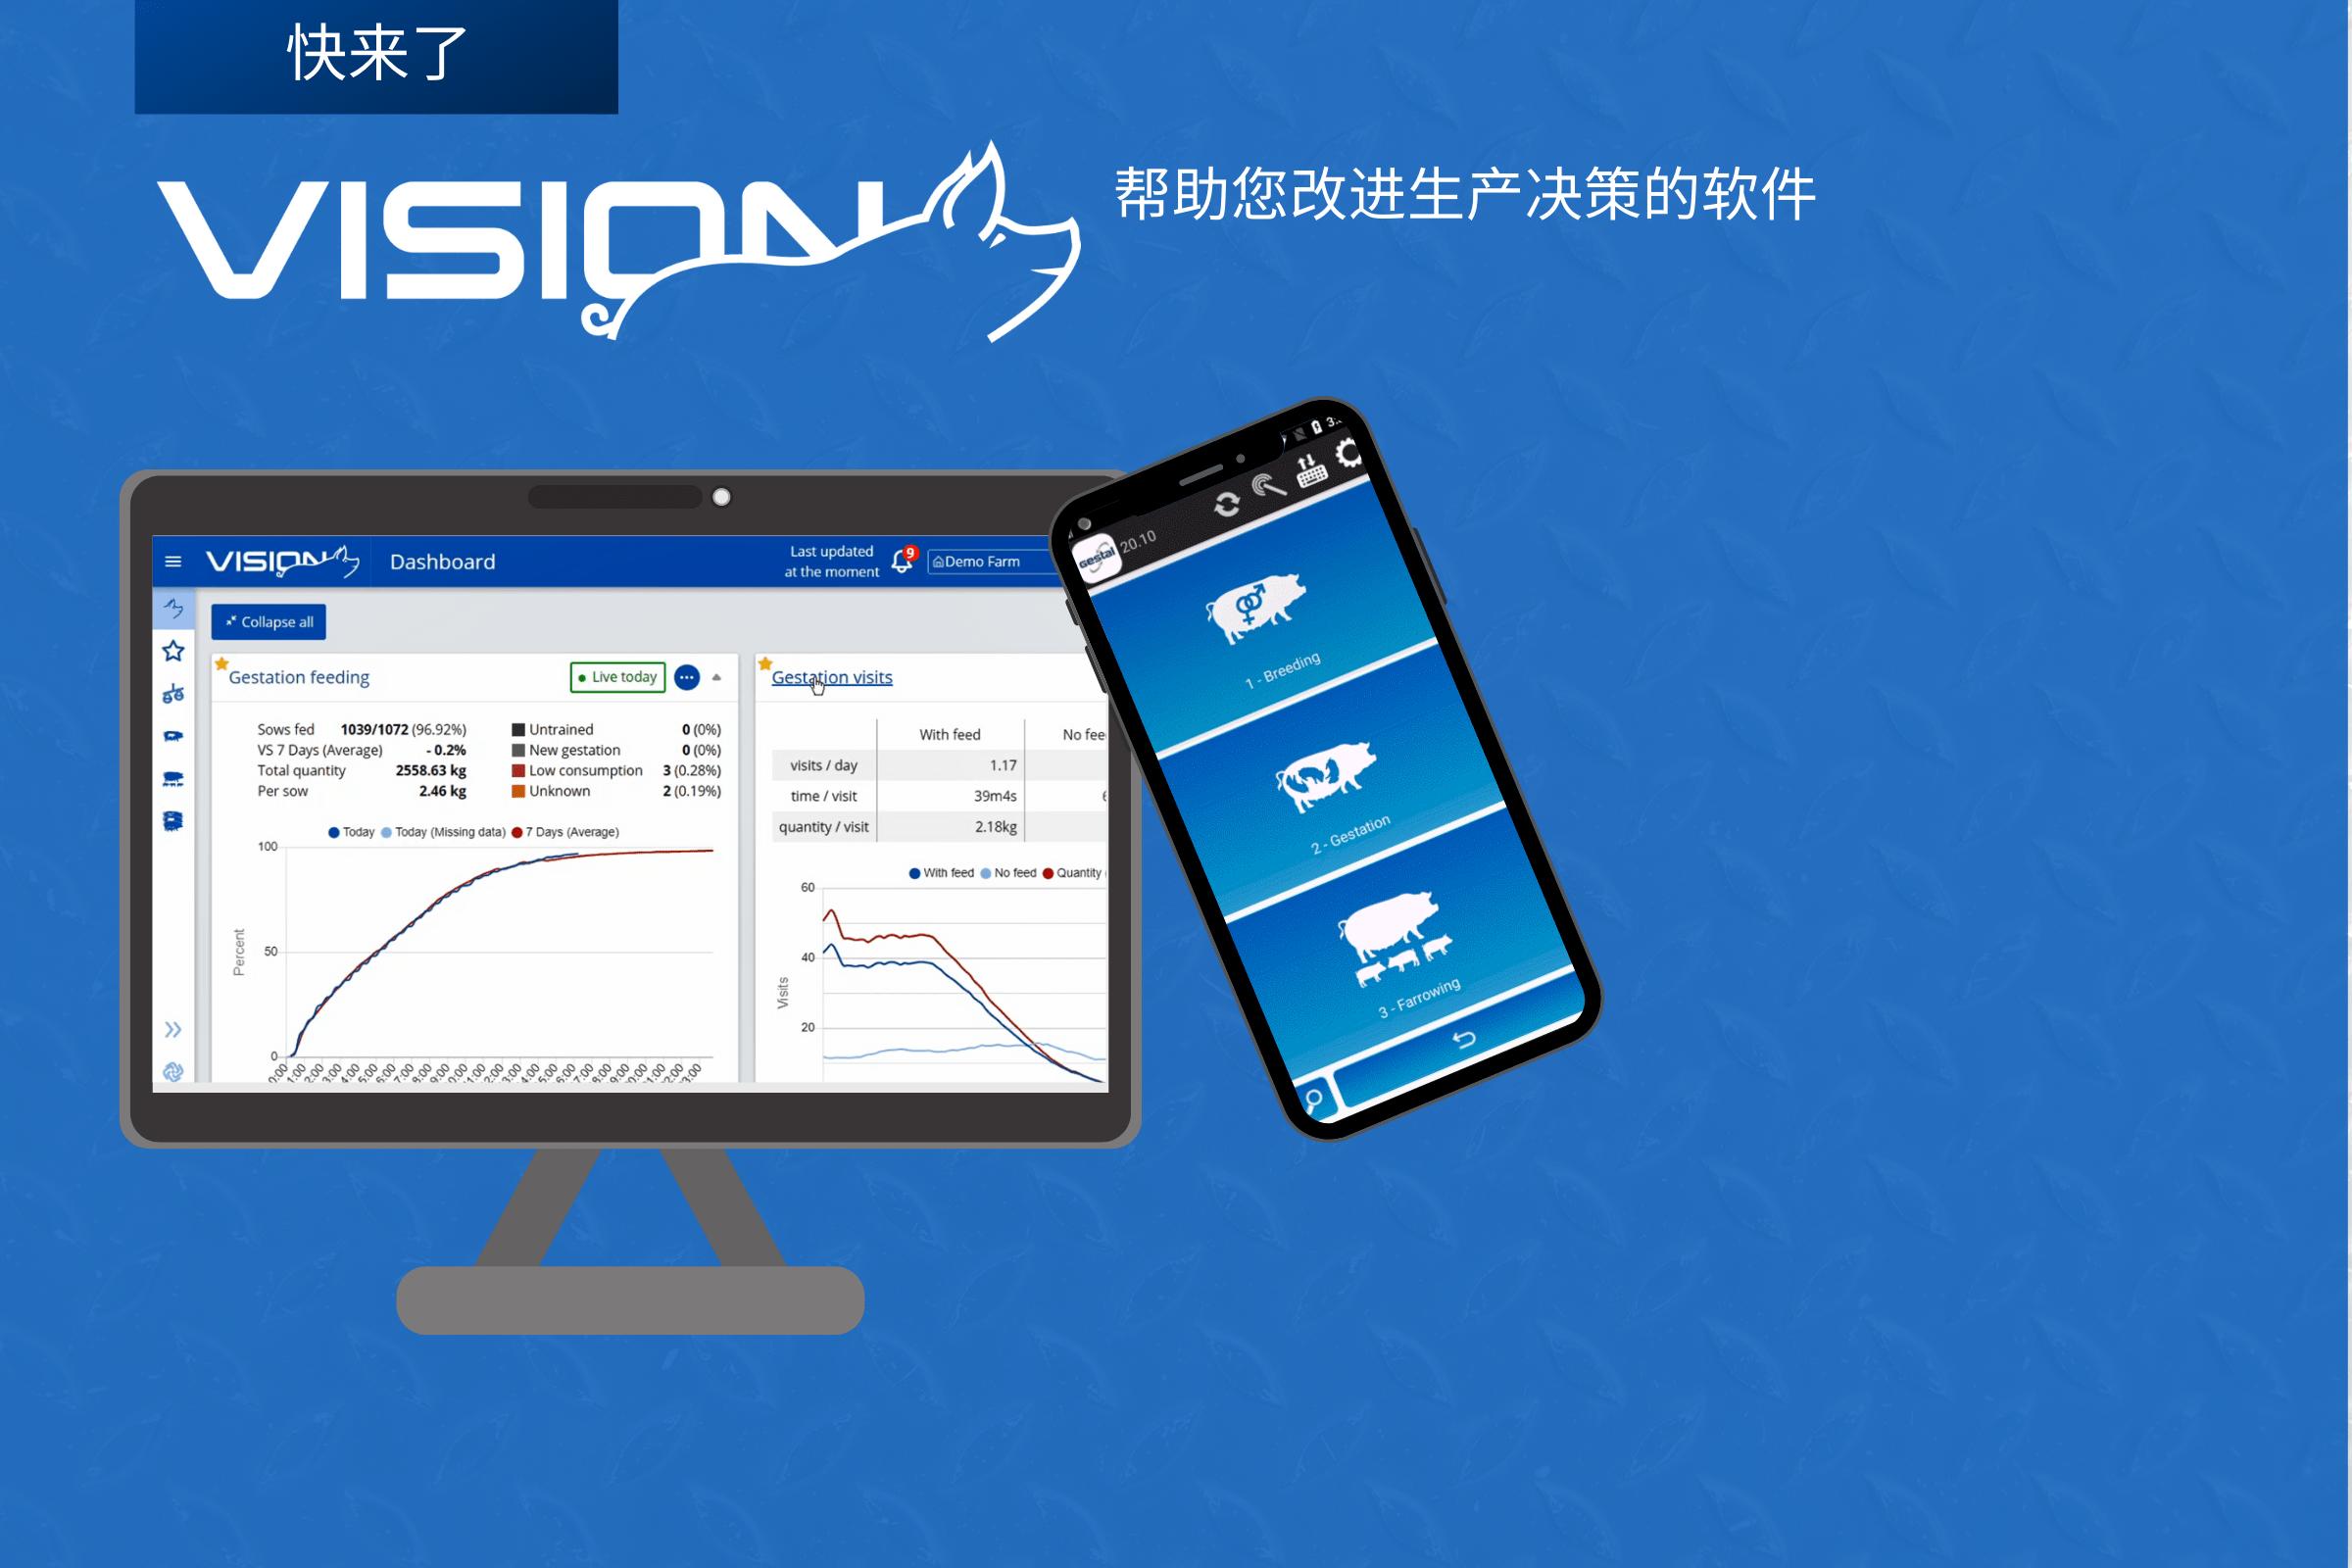 Vision - 猪场饲喂和猪群管理软件